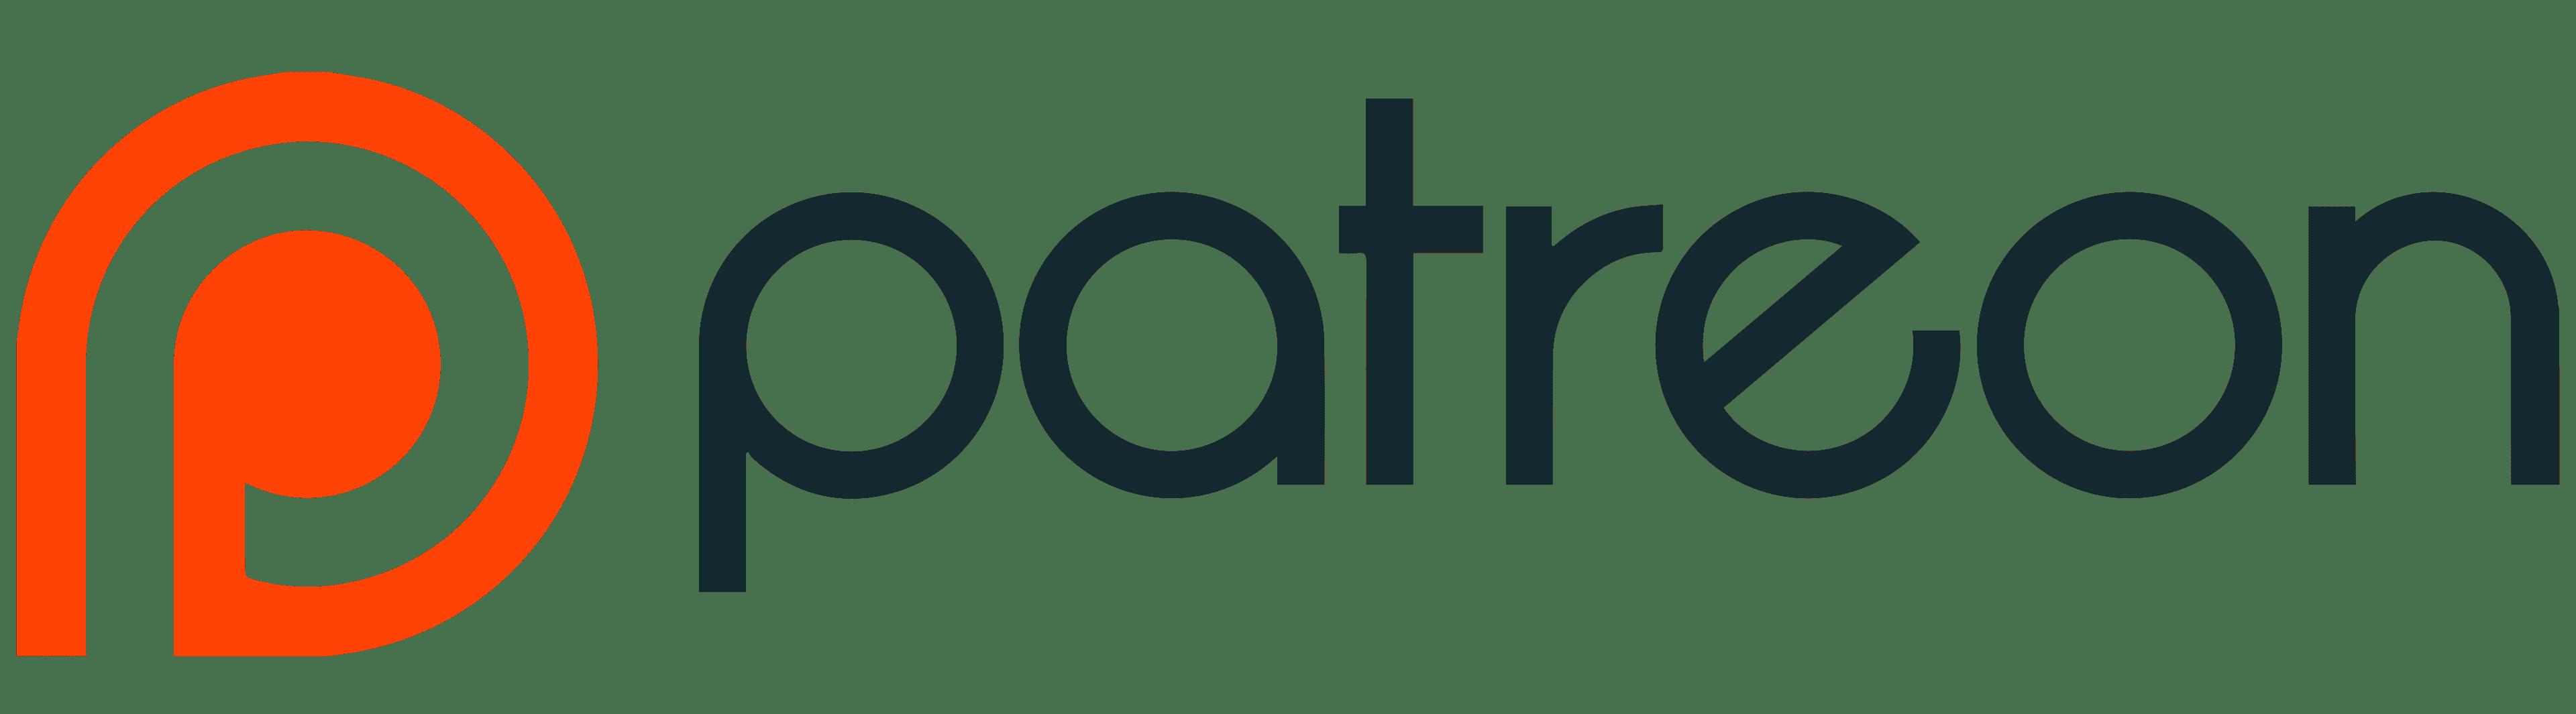 Patreon-Logo-2013-2017